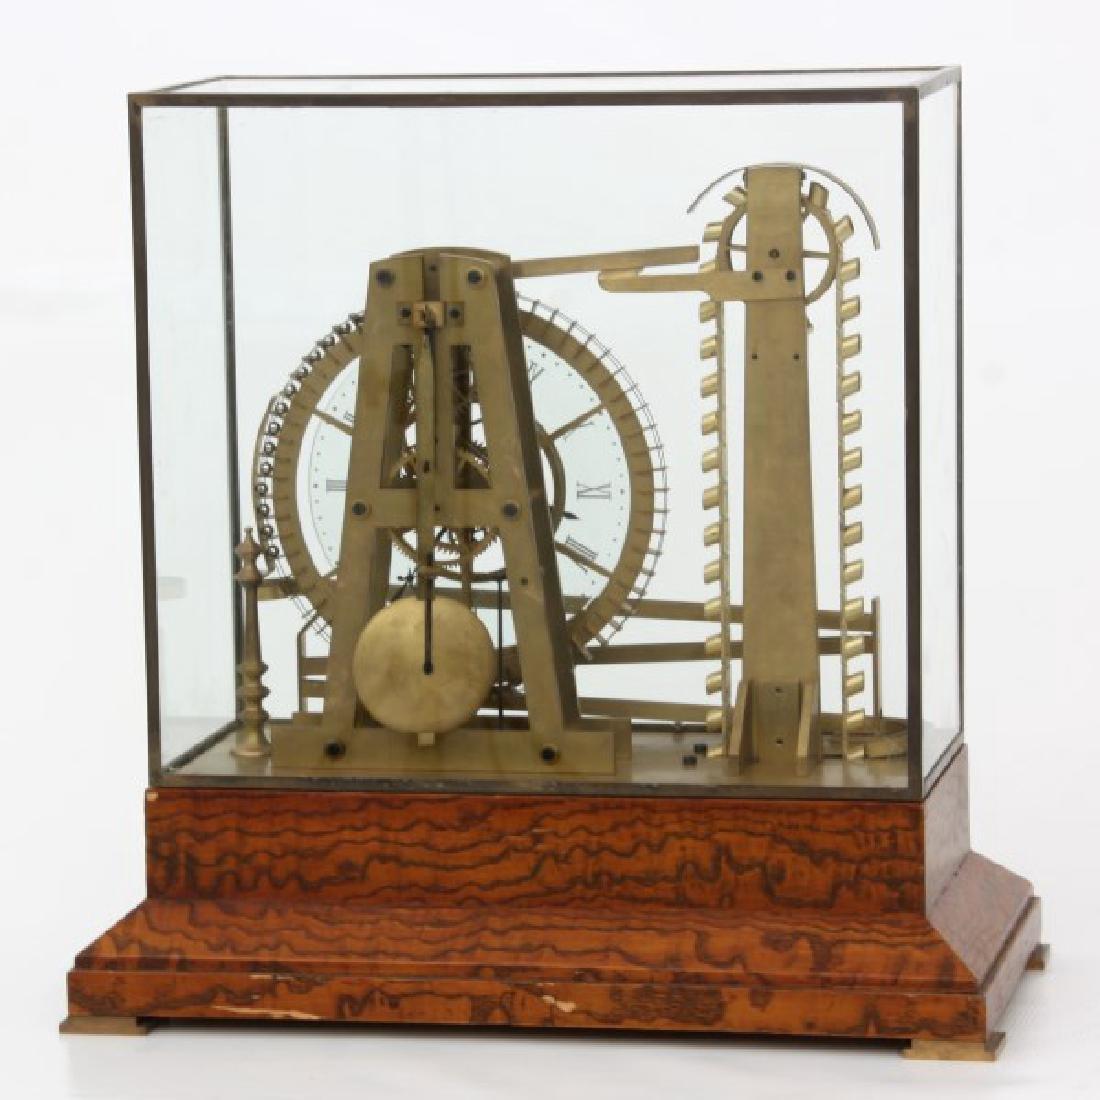 Animated Water Wheel Skeleton Clock (Replica) - 3